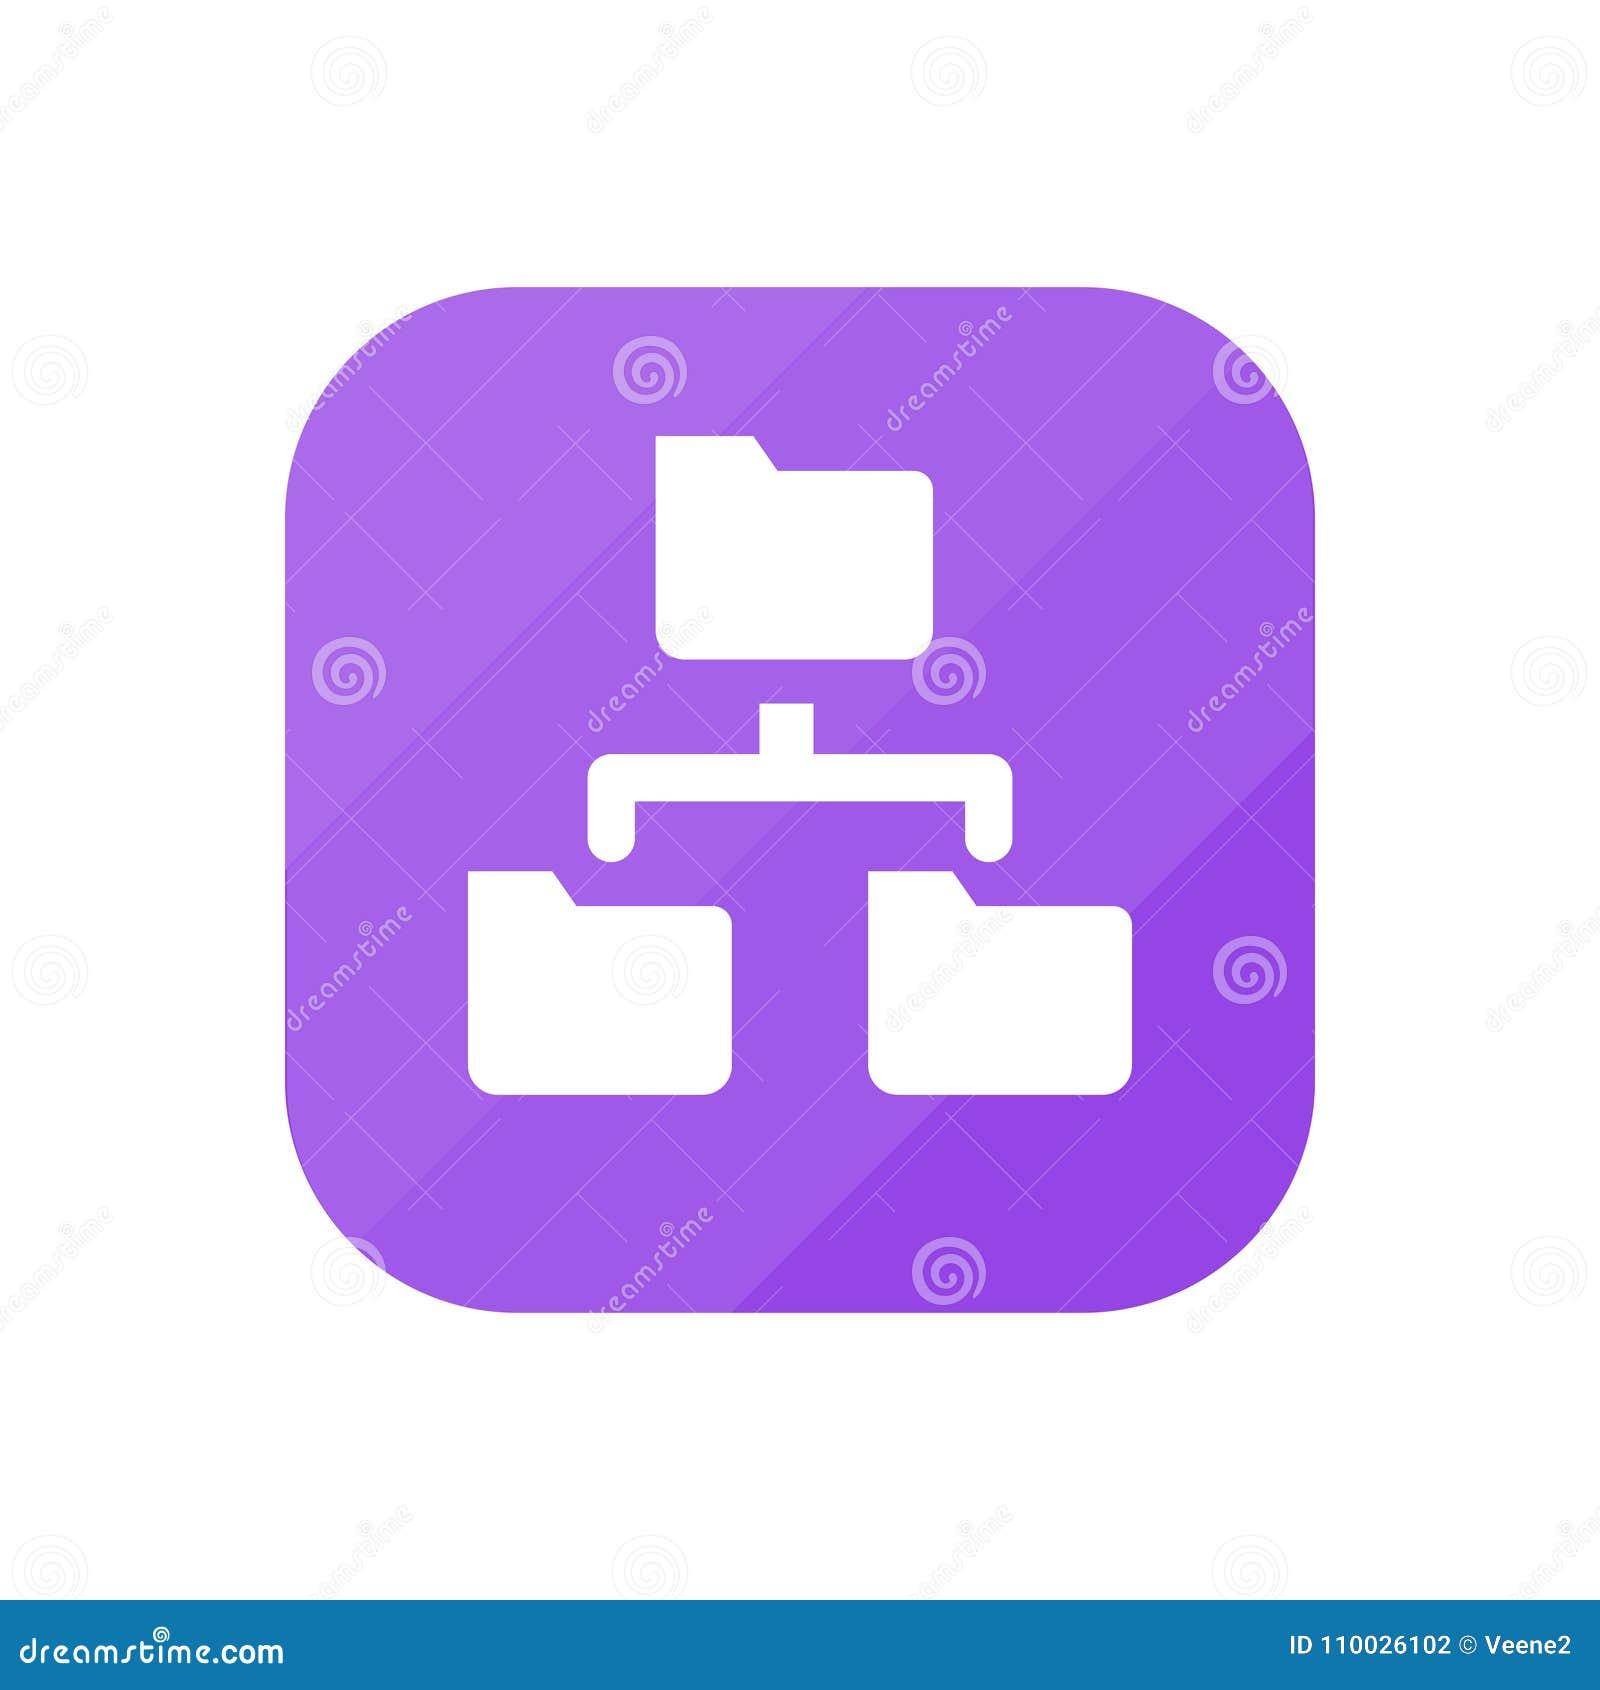 Sitemap - App Pictogram